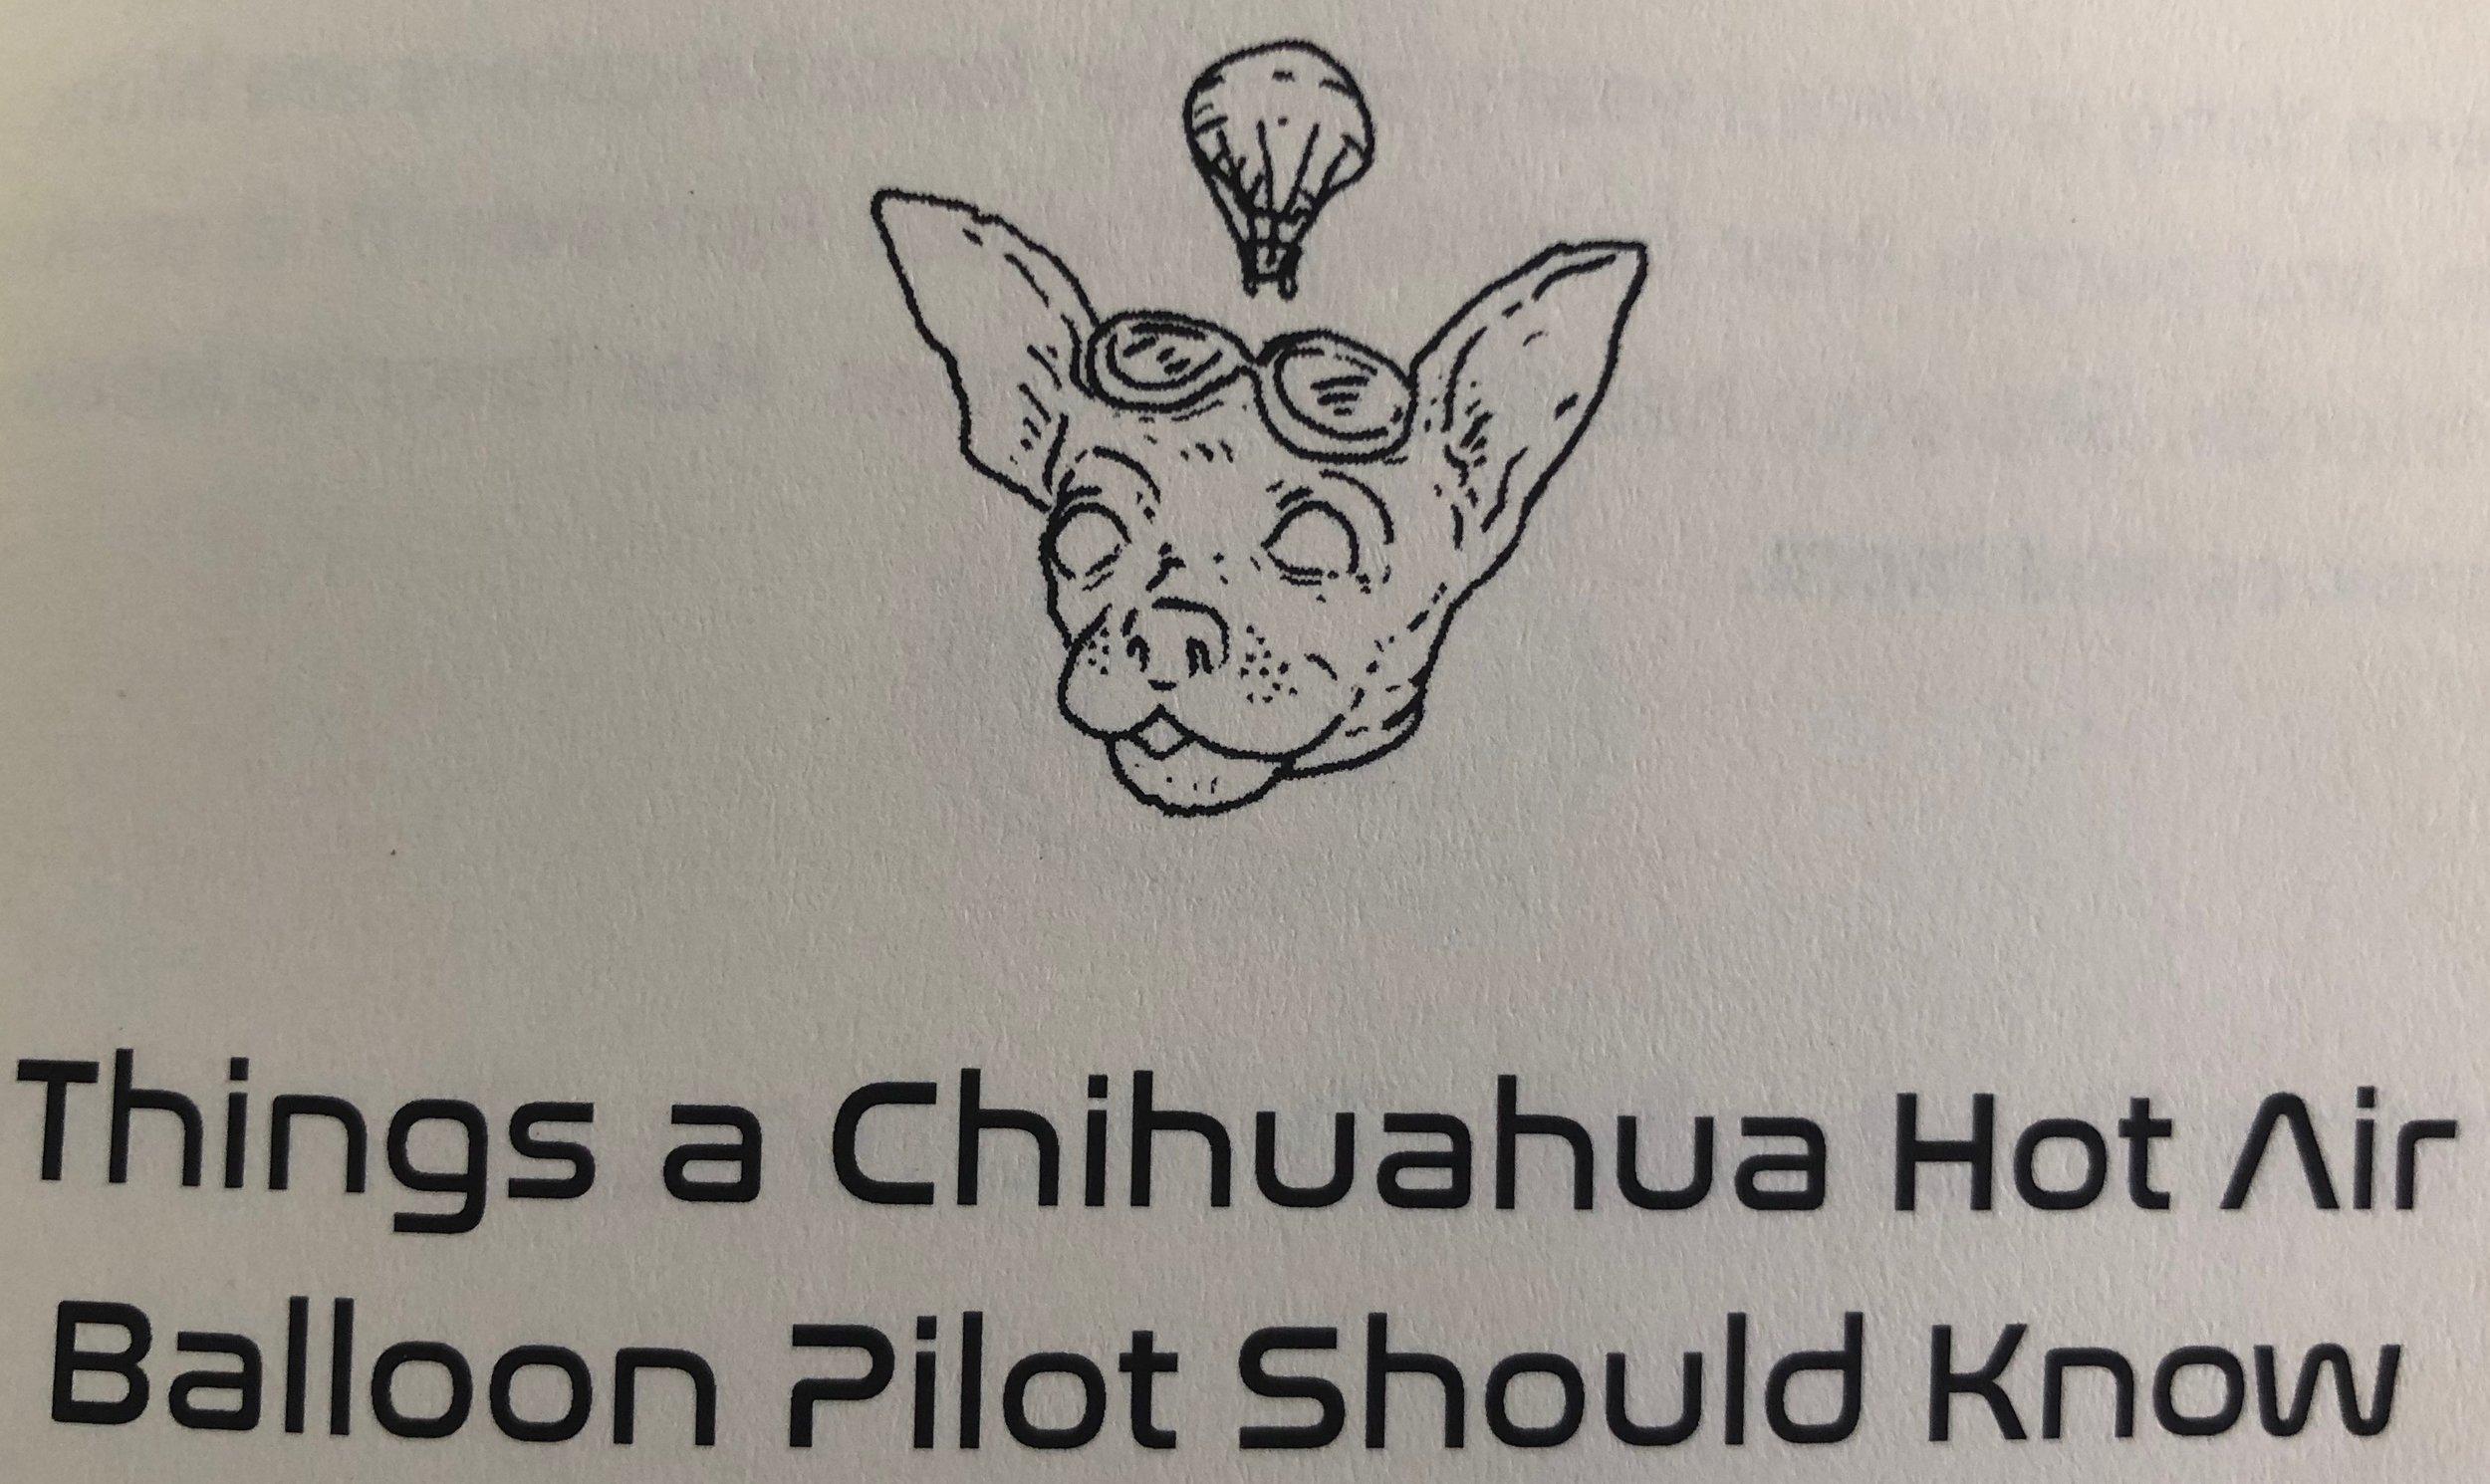 ChihuahuaHotAirBaloon.jpg